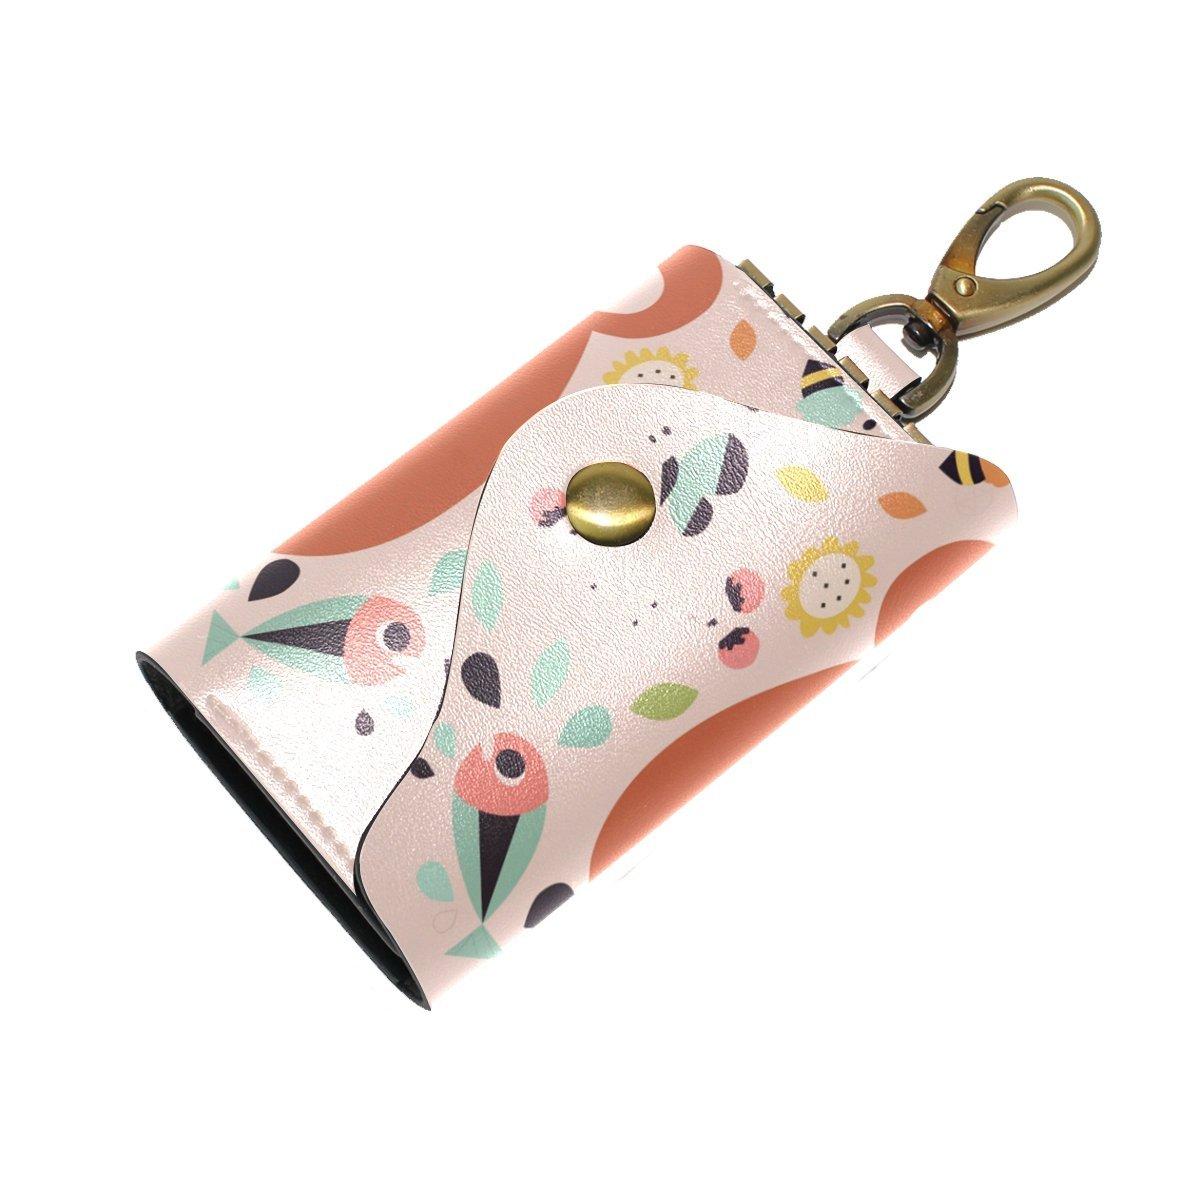 DEYYA Cartoon Animal Fox Leather Key Case Wallets Unisex Keychain Key Holder with 6 Hooks Snap Closure